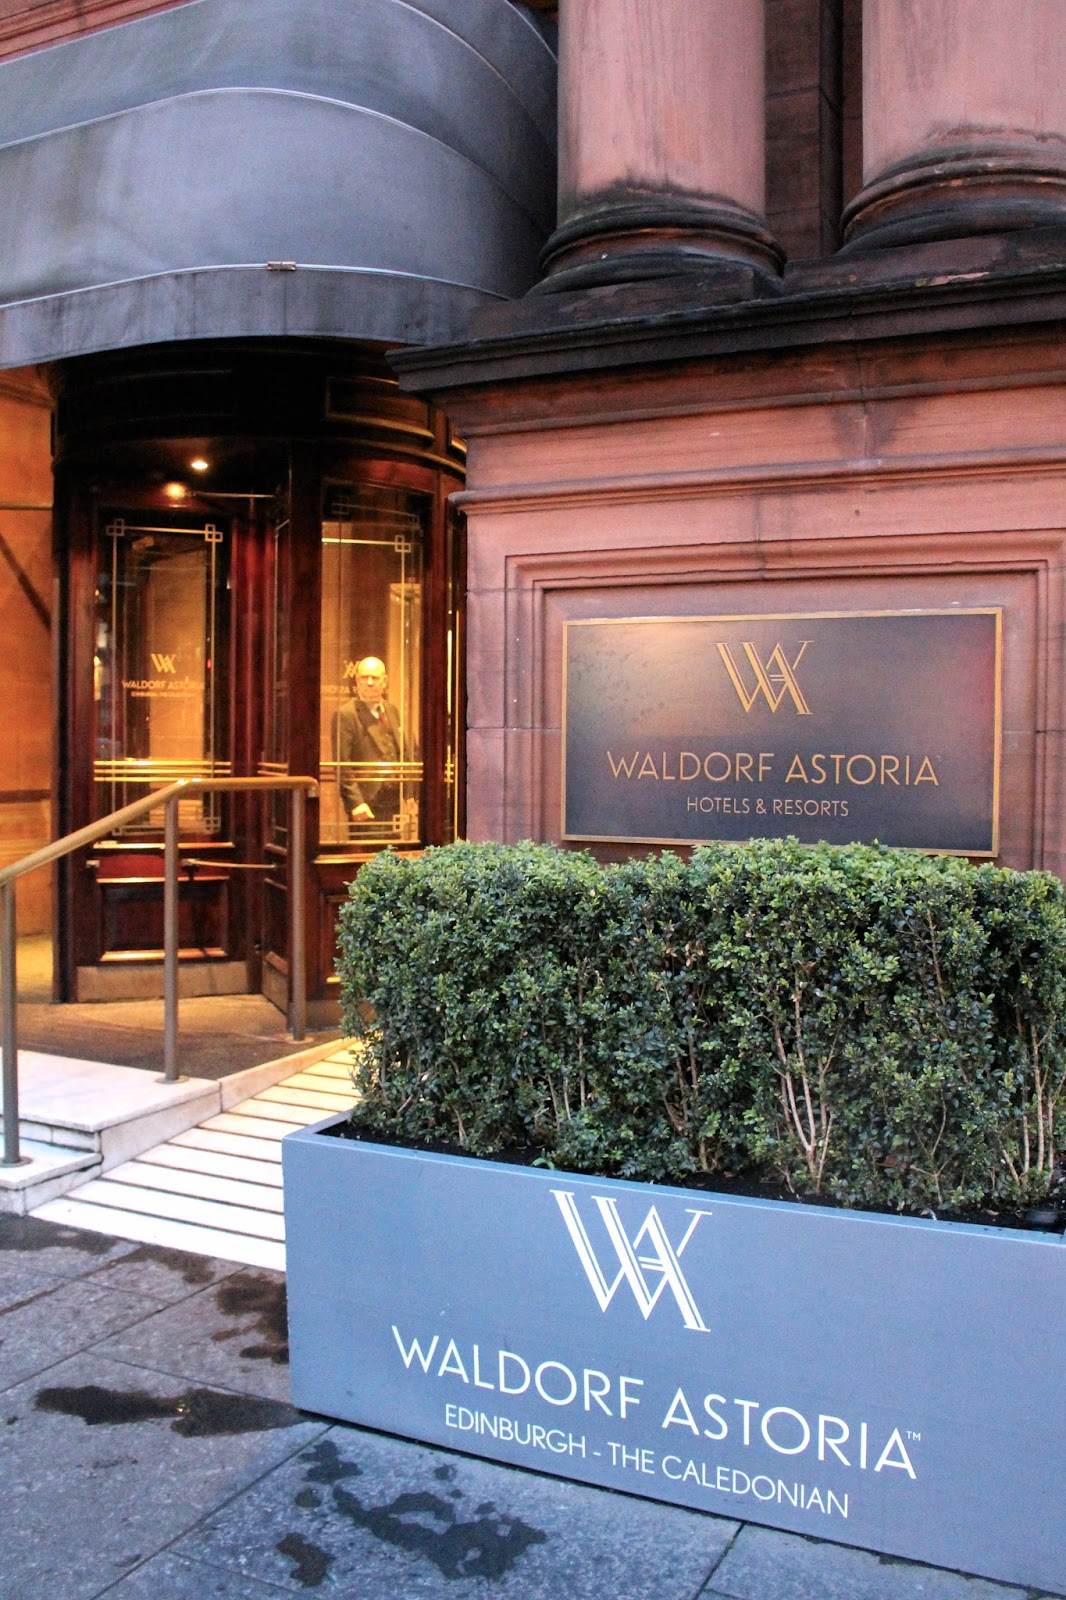 waldorf astoria edinburgh the caledonian entrance